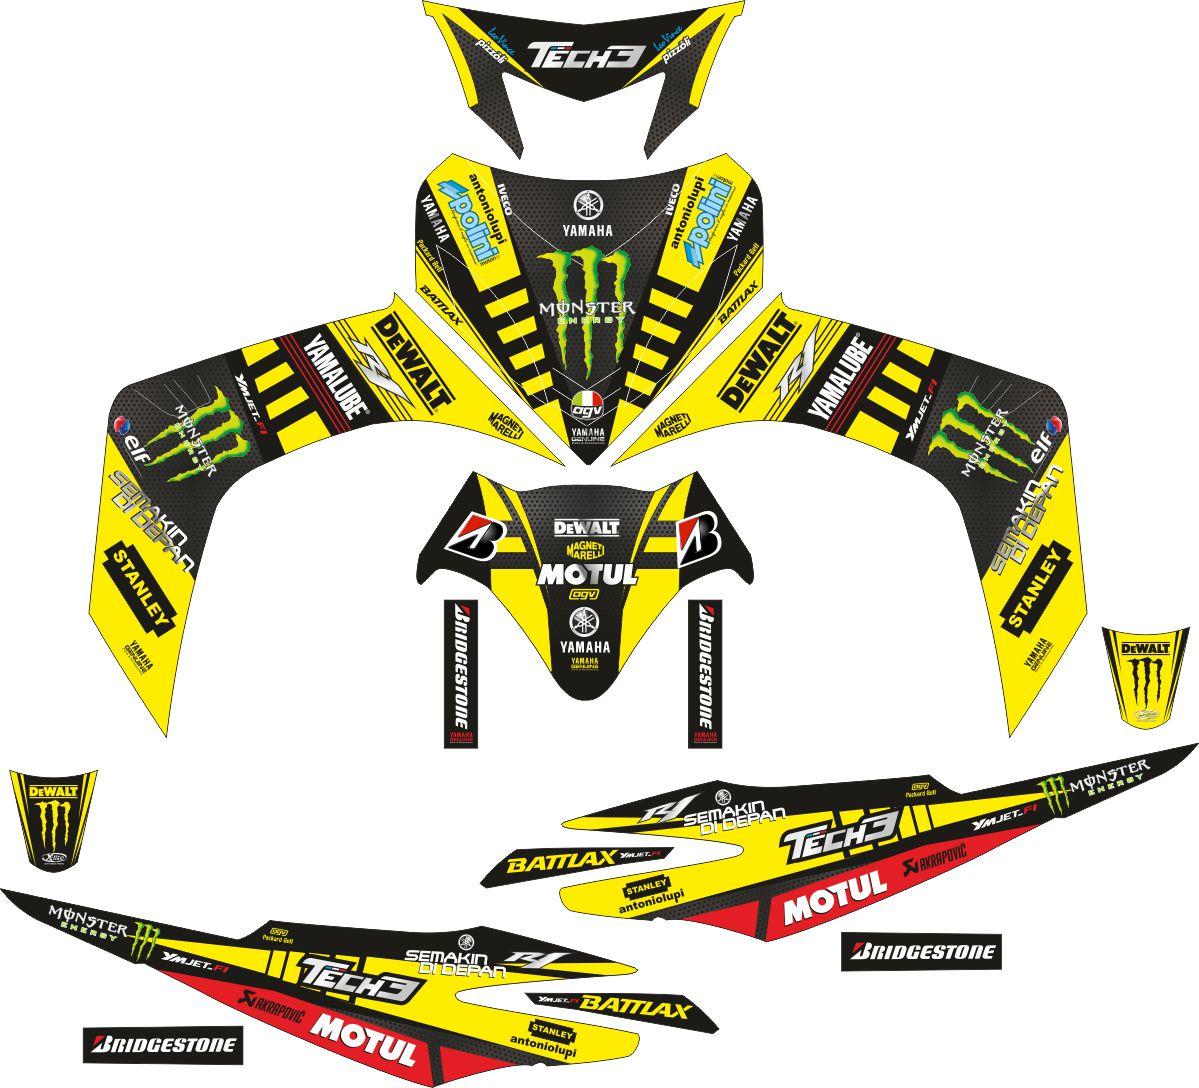 Комплект наклеек на скутер YAMAHA JUPITER MX 2007 TECH3